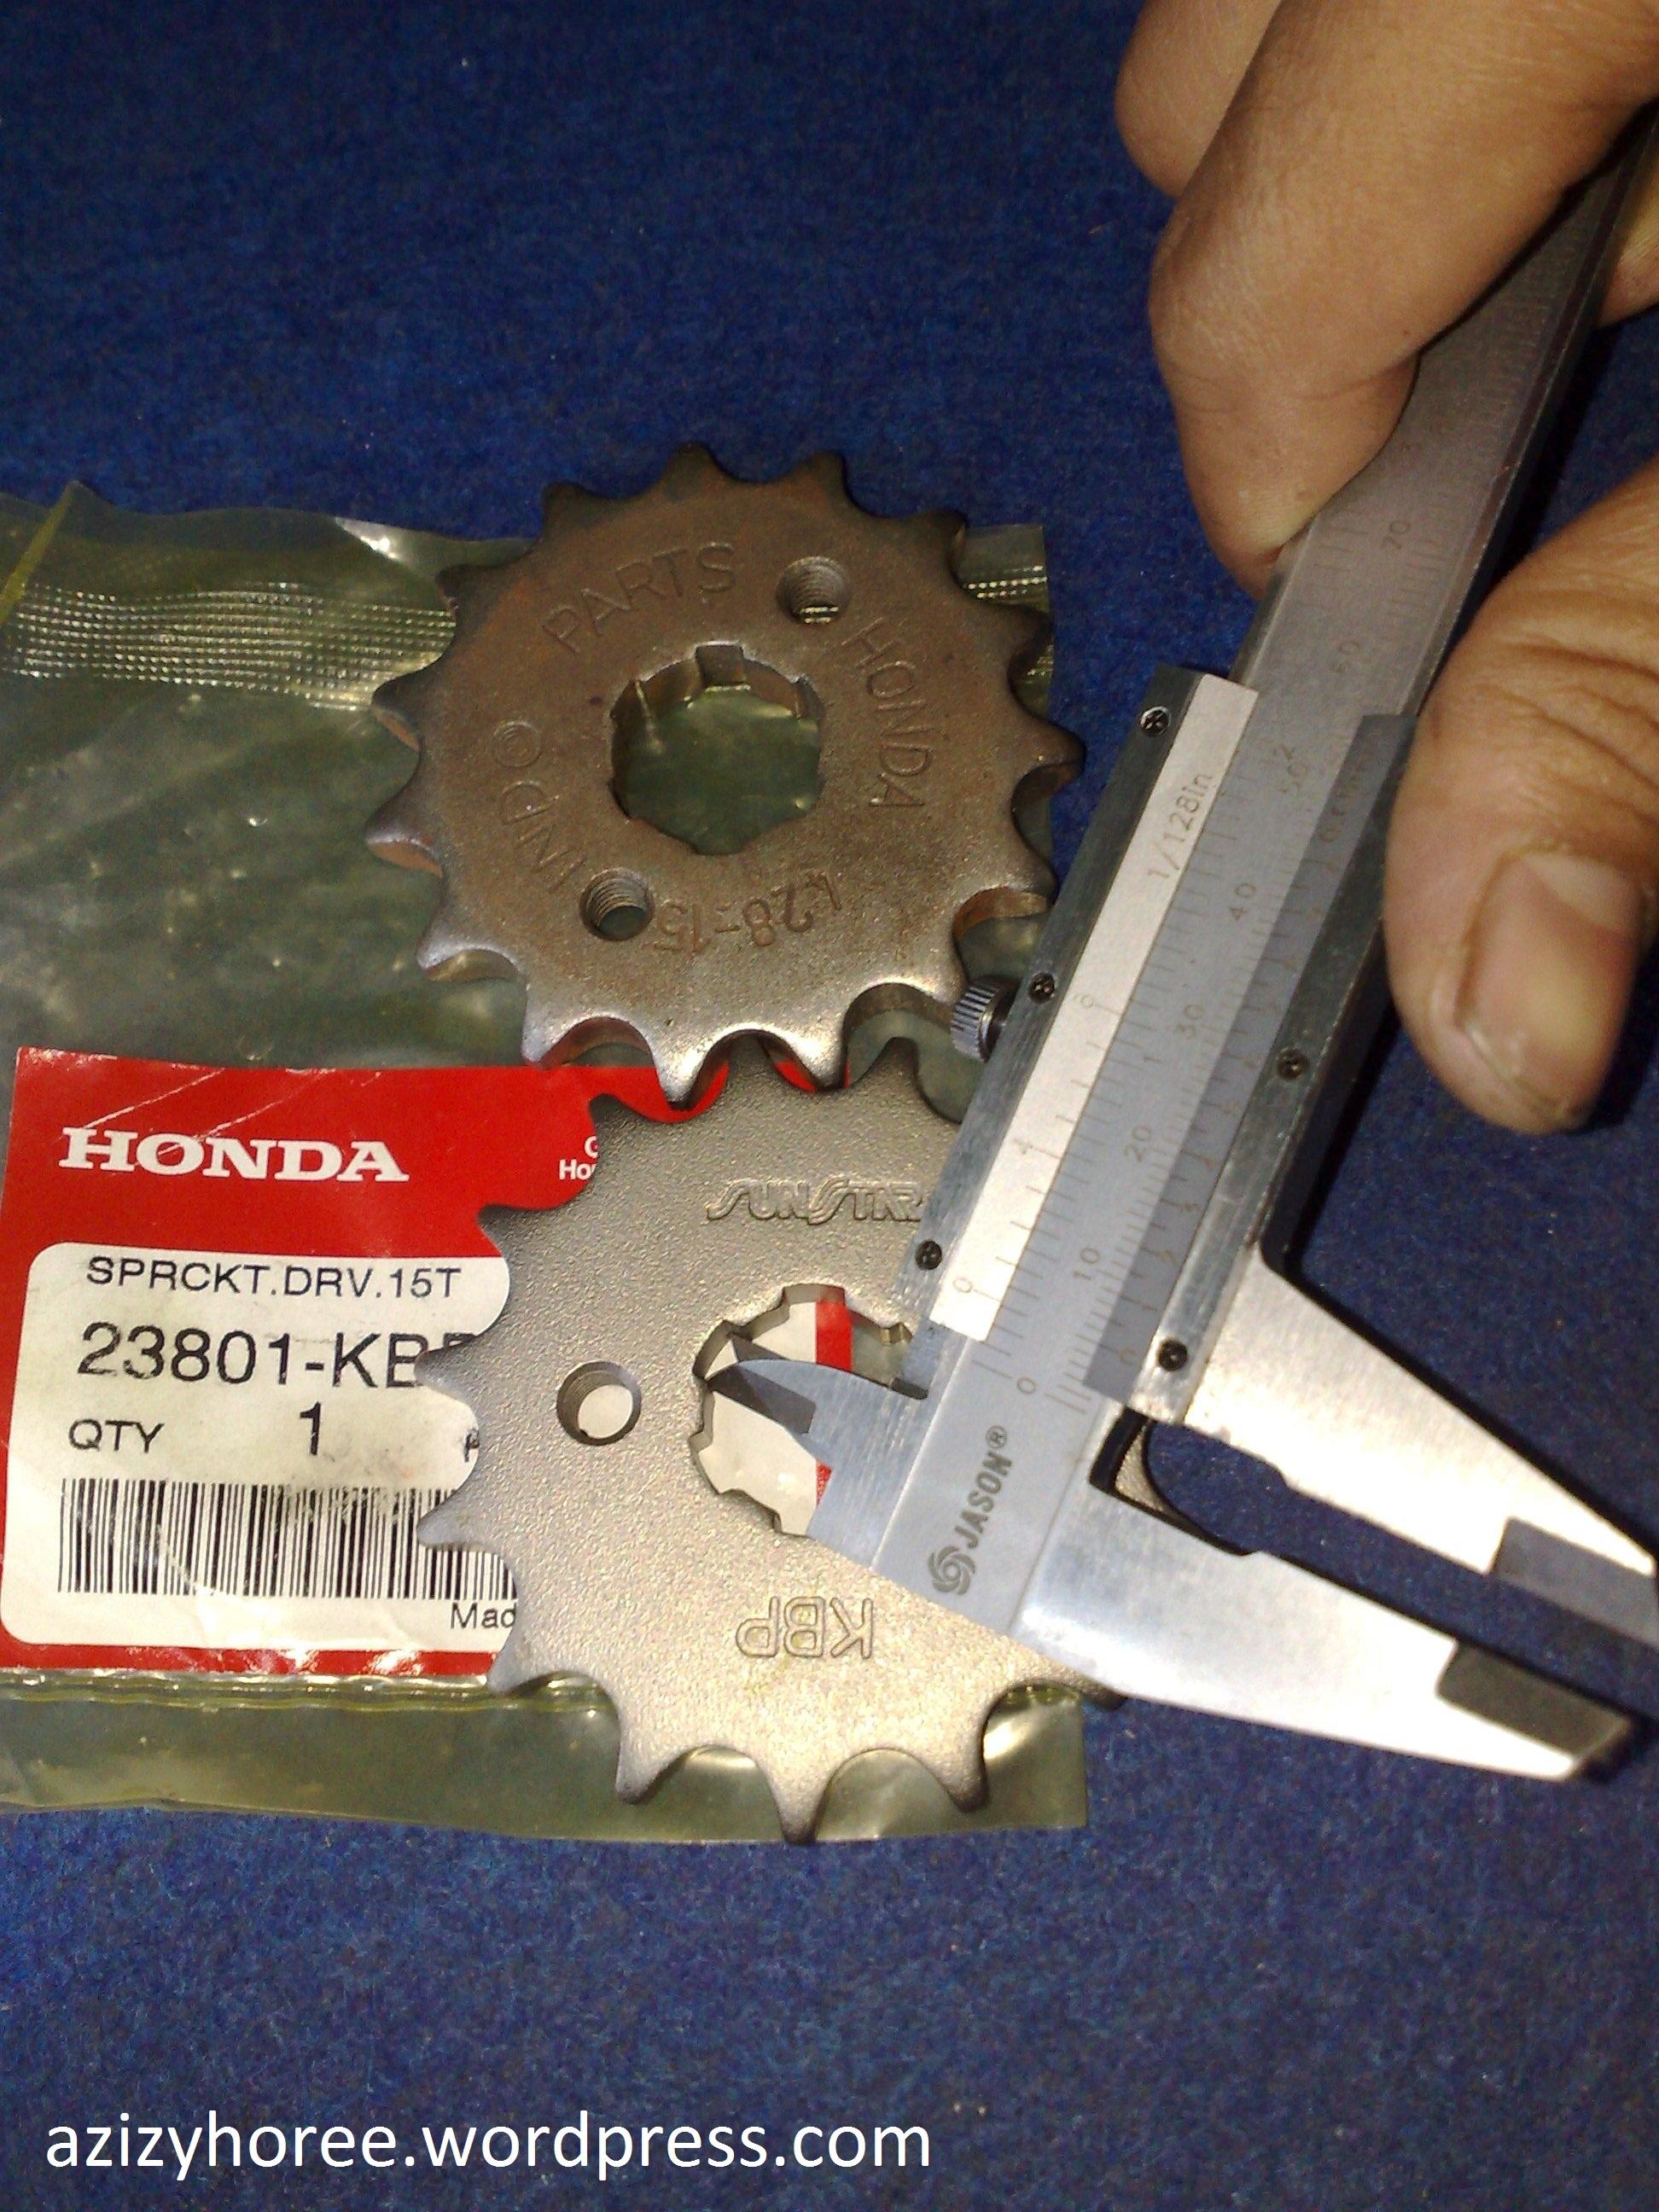 OTOMOTIF Subsititusi Gear Honda CBR 150